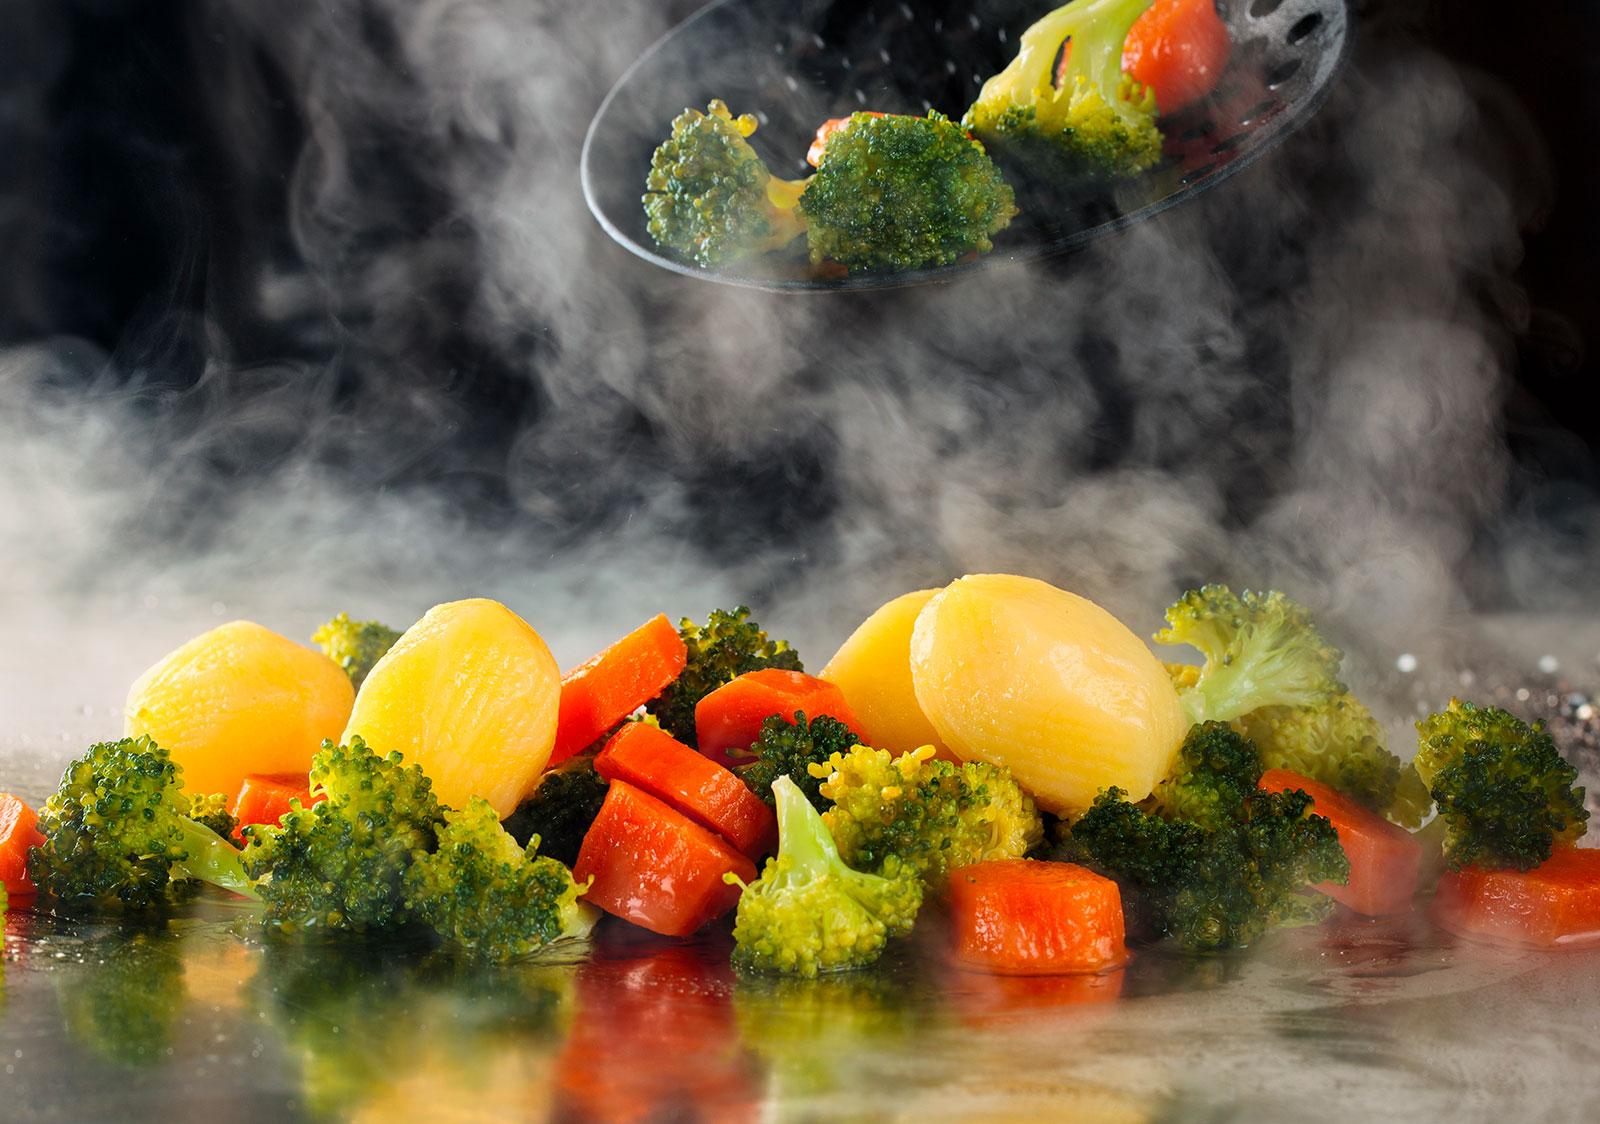 VAPHOOR- automatic steam cooker nilma